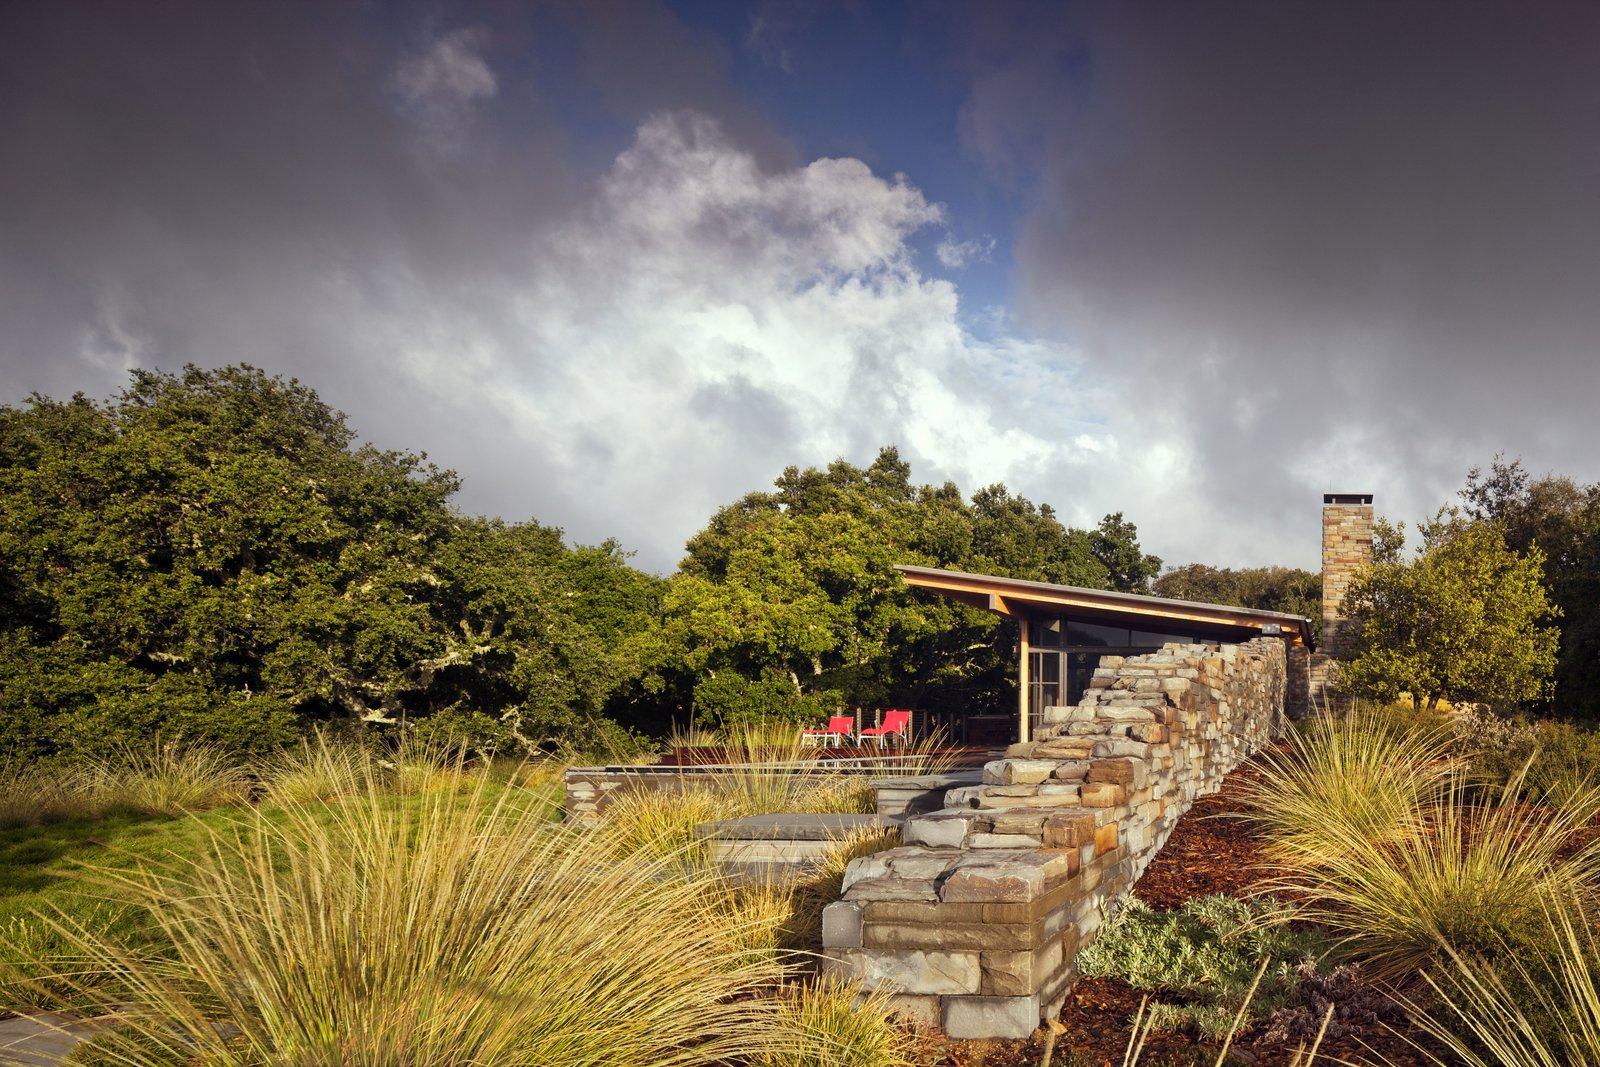 Outdoor, Stone Fences, Wall, Trees, and Shrubs  Halls Ridge Knoll by Bohlin Cywinski Jackson